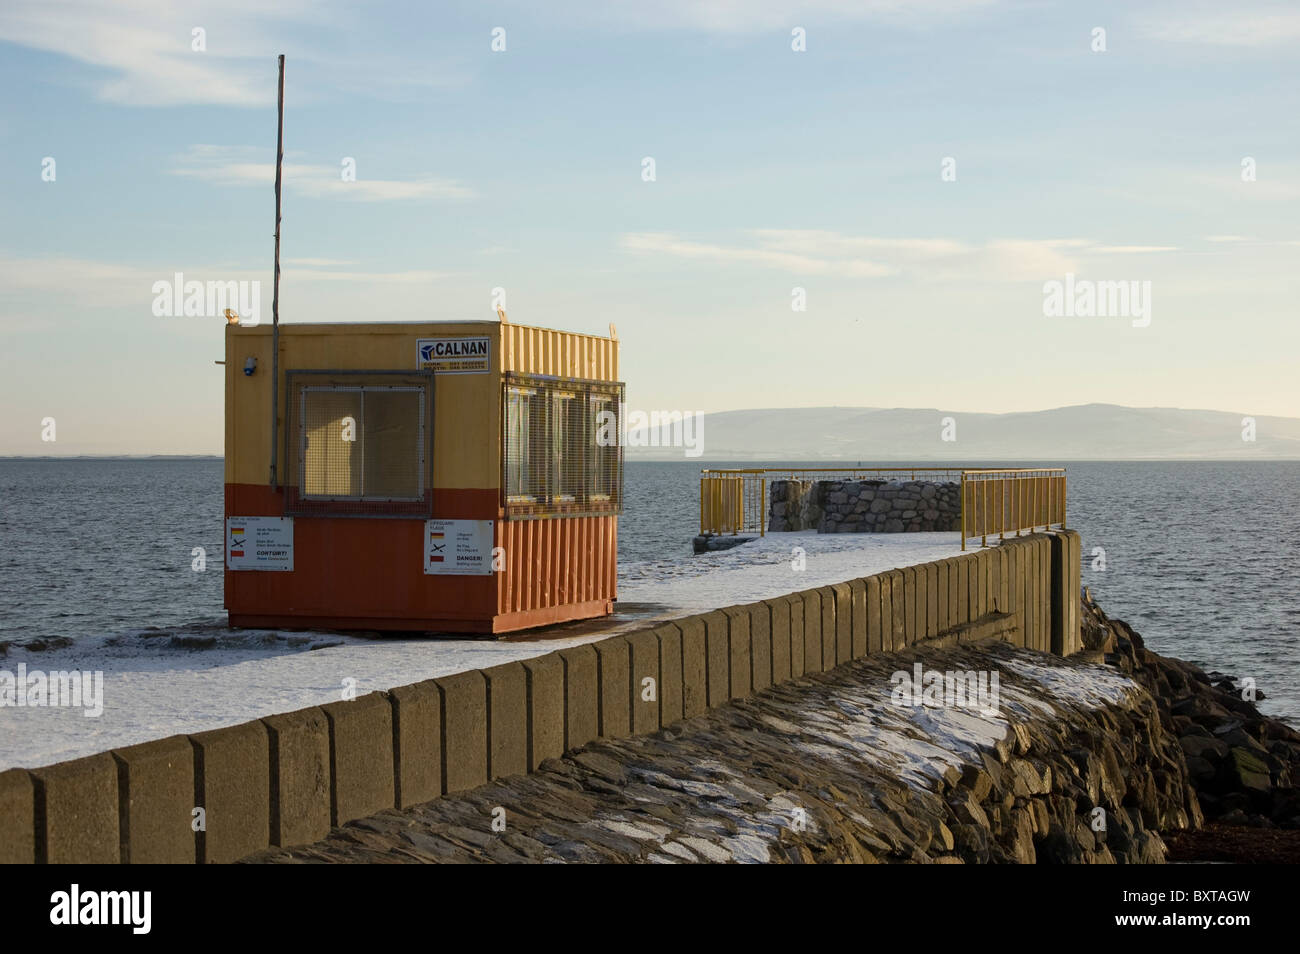 Lifeguard Hut, Galway Bay, Ireland - Stock Image